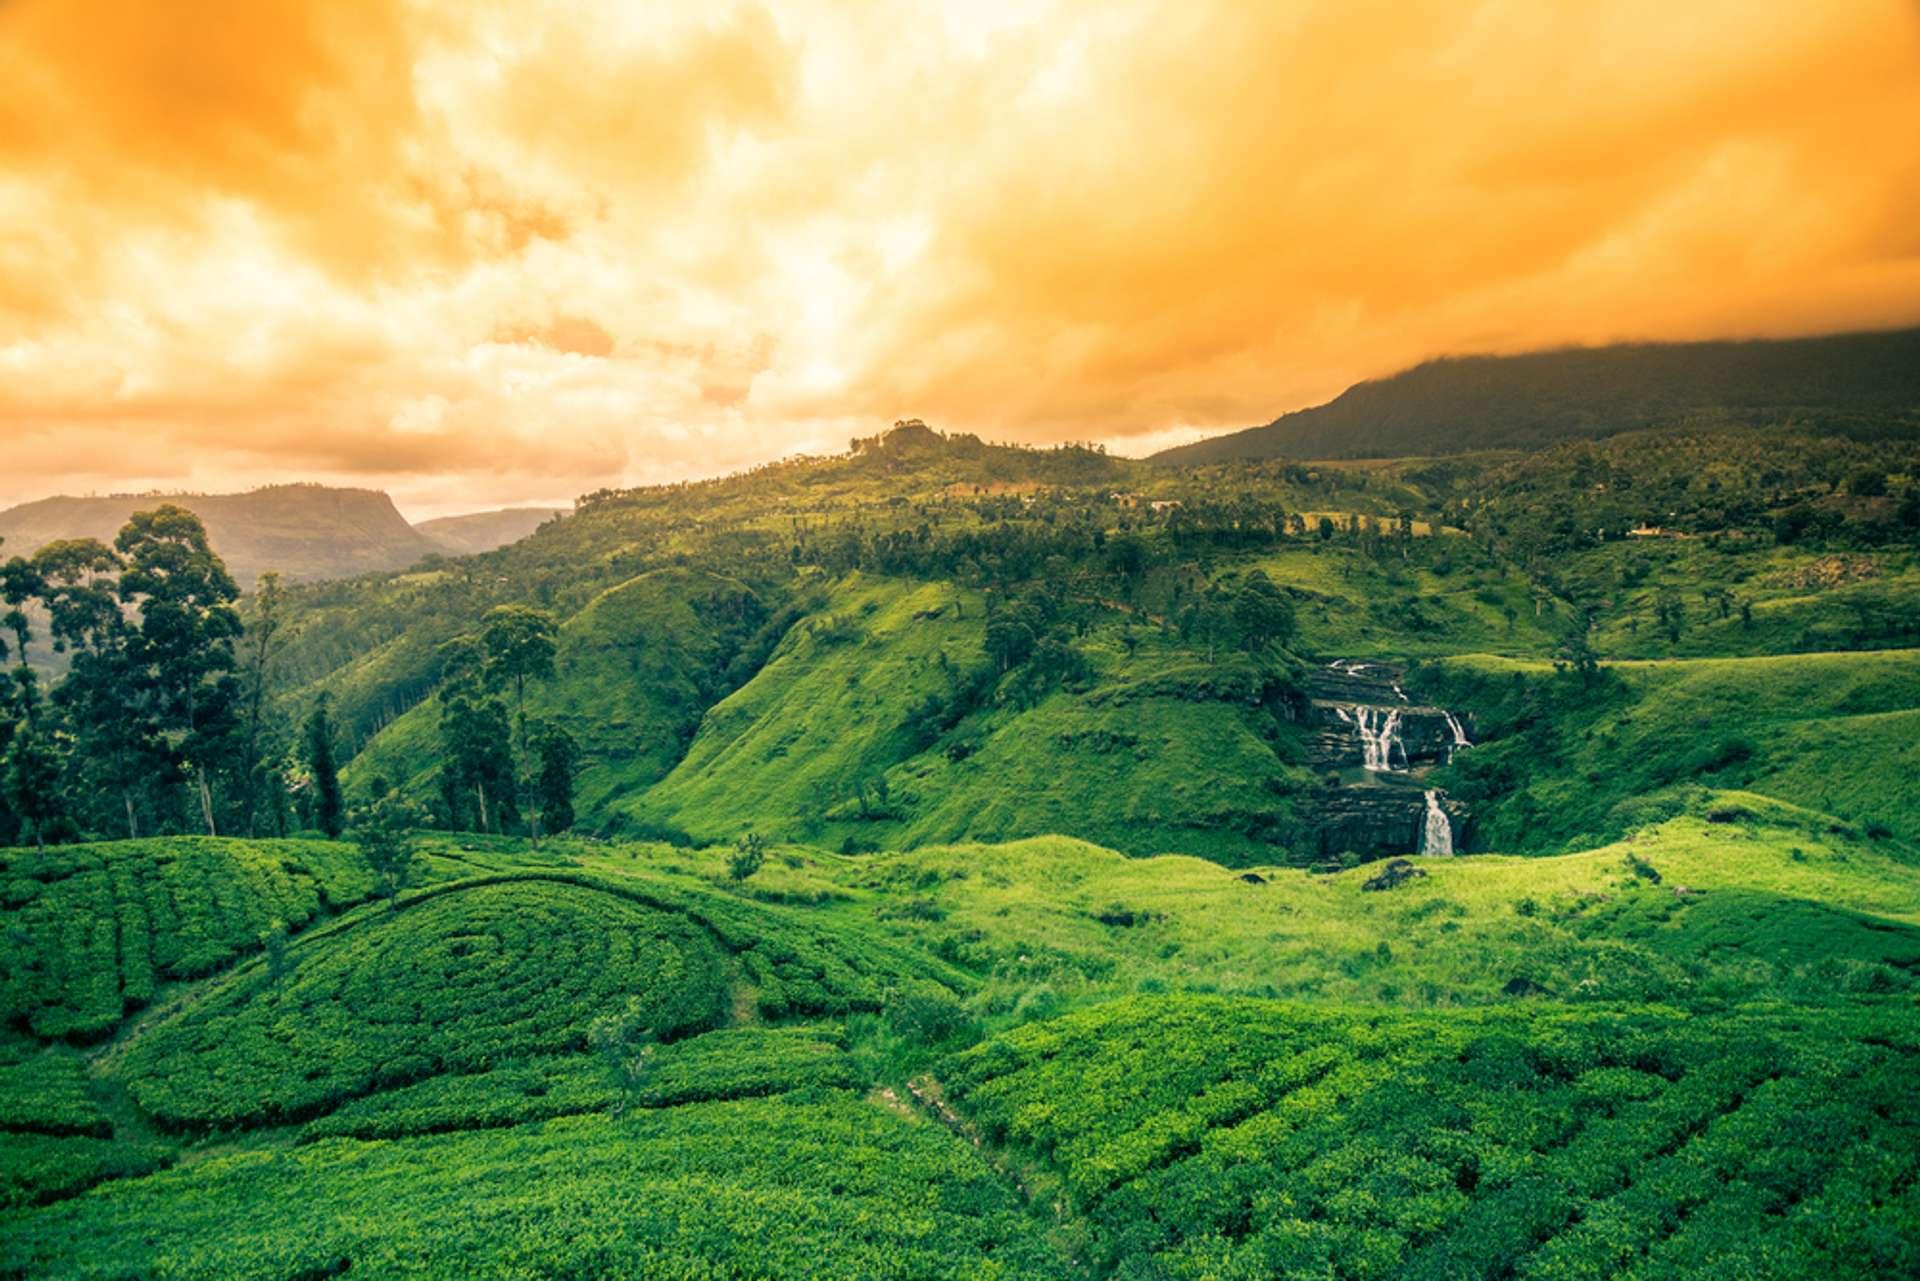 Sri Lanka st. clairs waterval